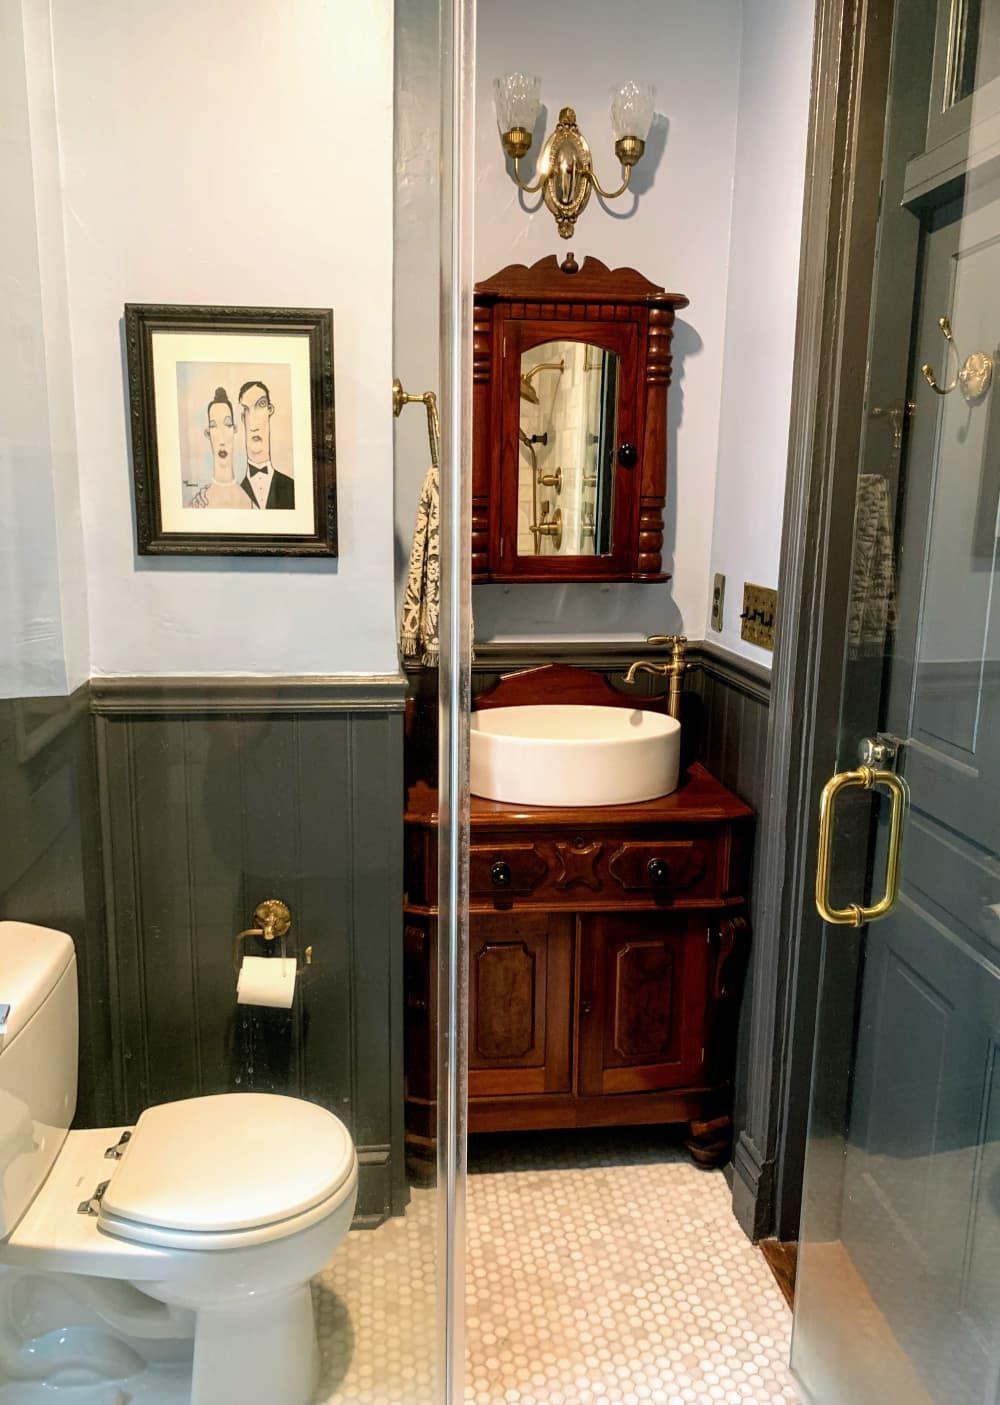 16 Row House Interior Design Ideas: A Historic Row House Has A Colorful Exterior And Charming Interior